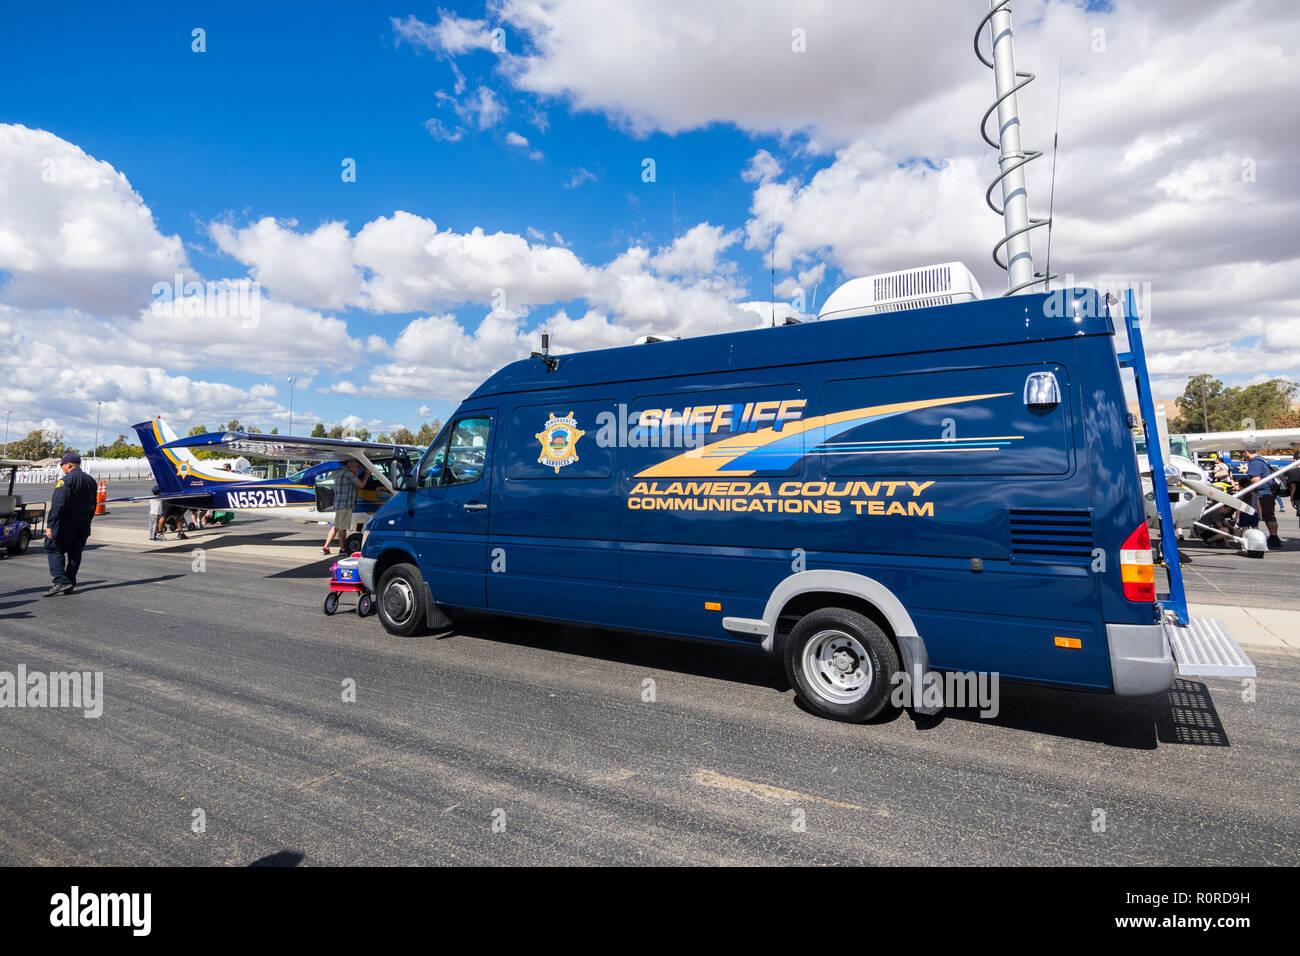 Alameda County Sheriff Stock Photos & Alameda County Sheriff